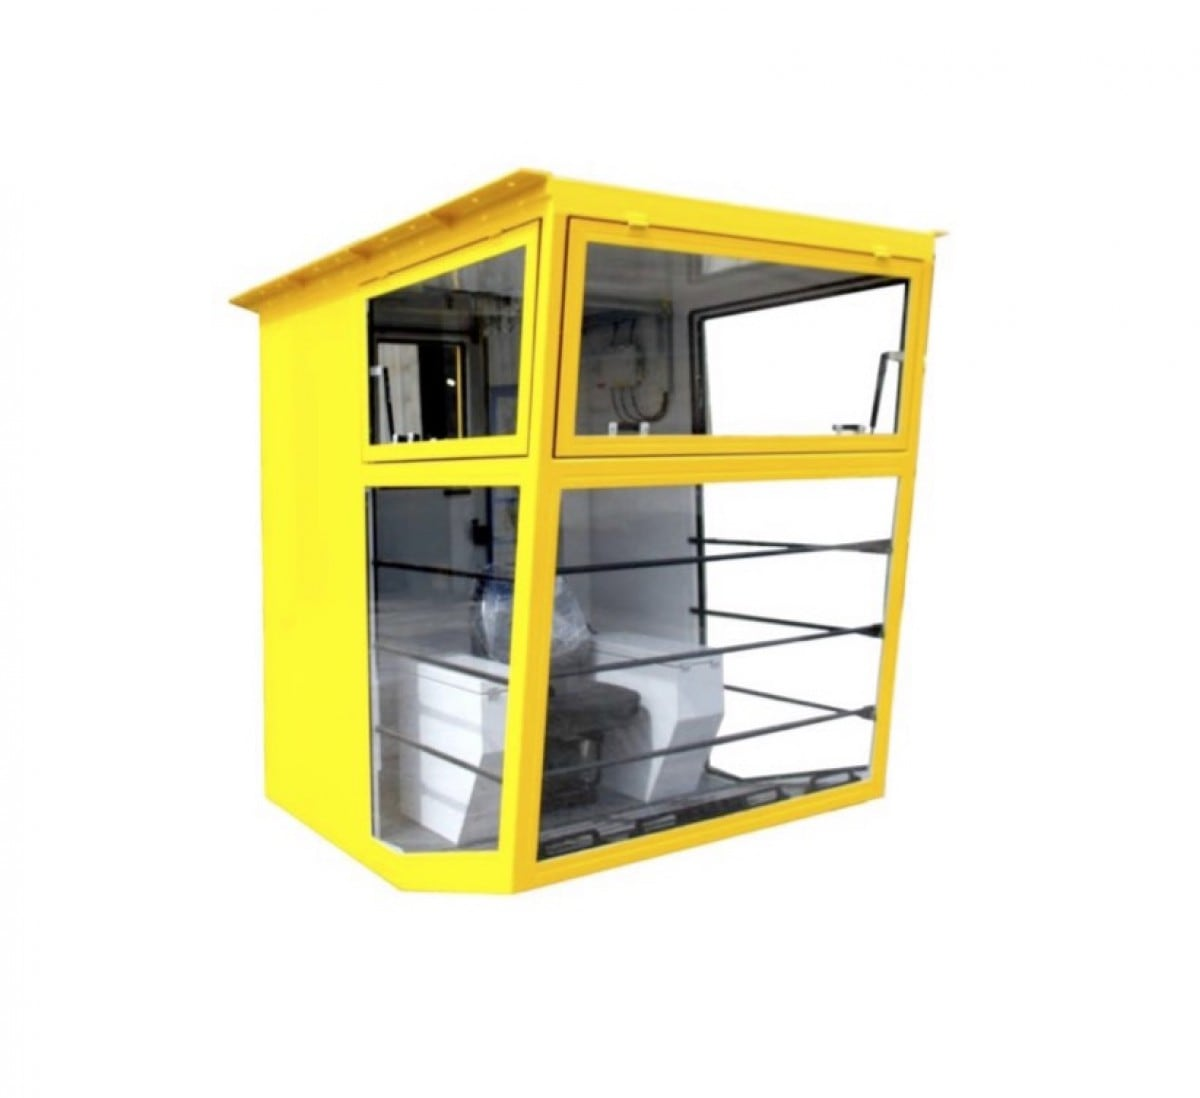 Petrokab cabine, model M: 2,25 × 1,6 × 2,2 m